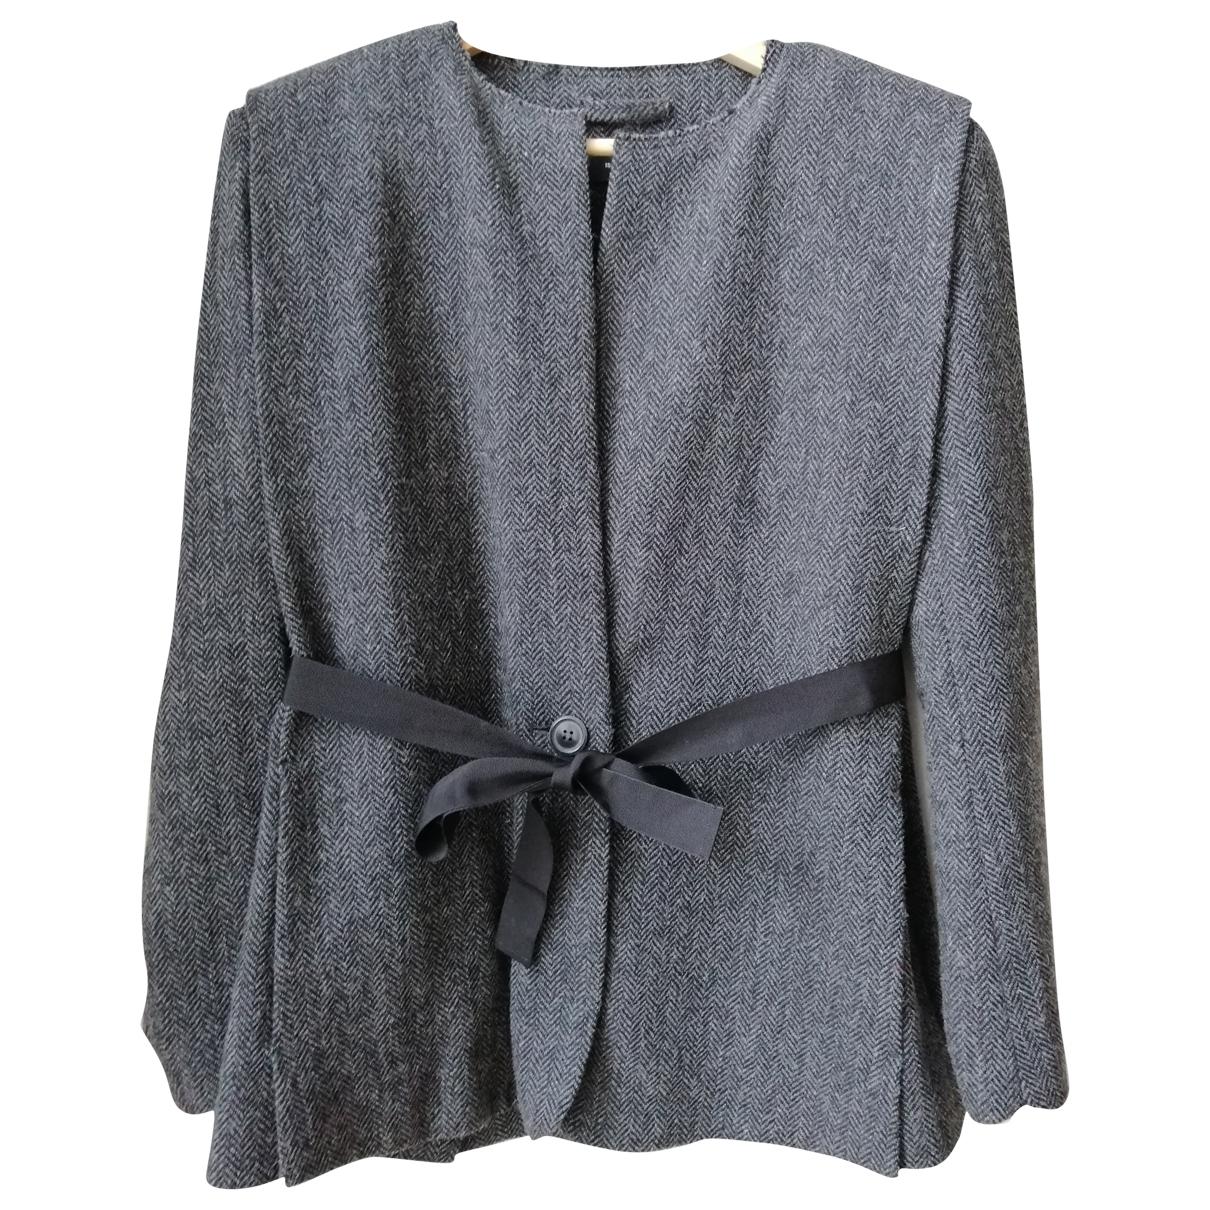 Isabel Marant \N Anthracite Wool jacket for Women 40 FR